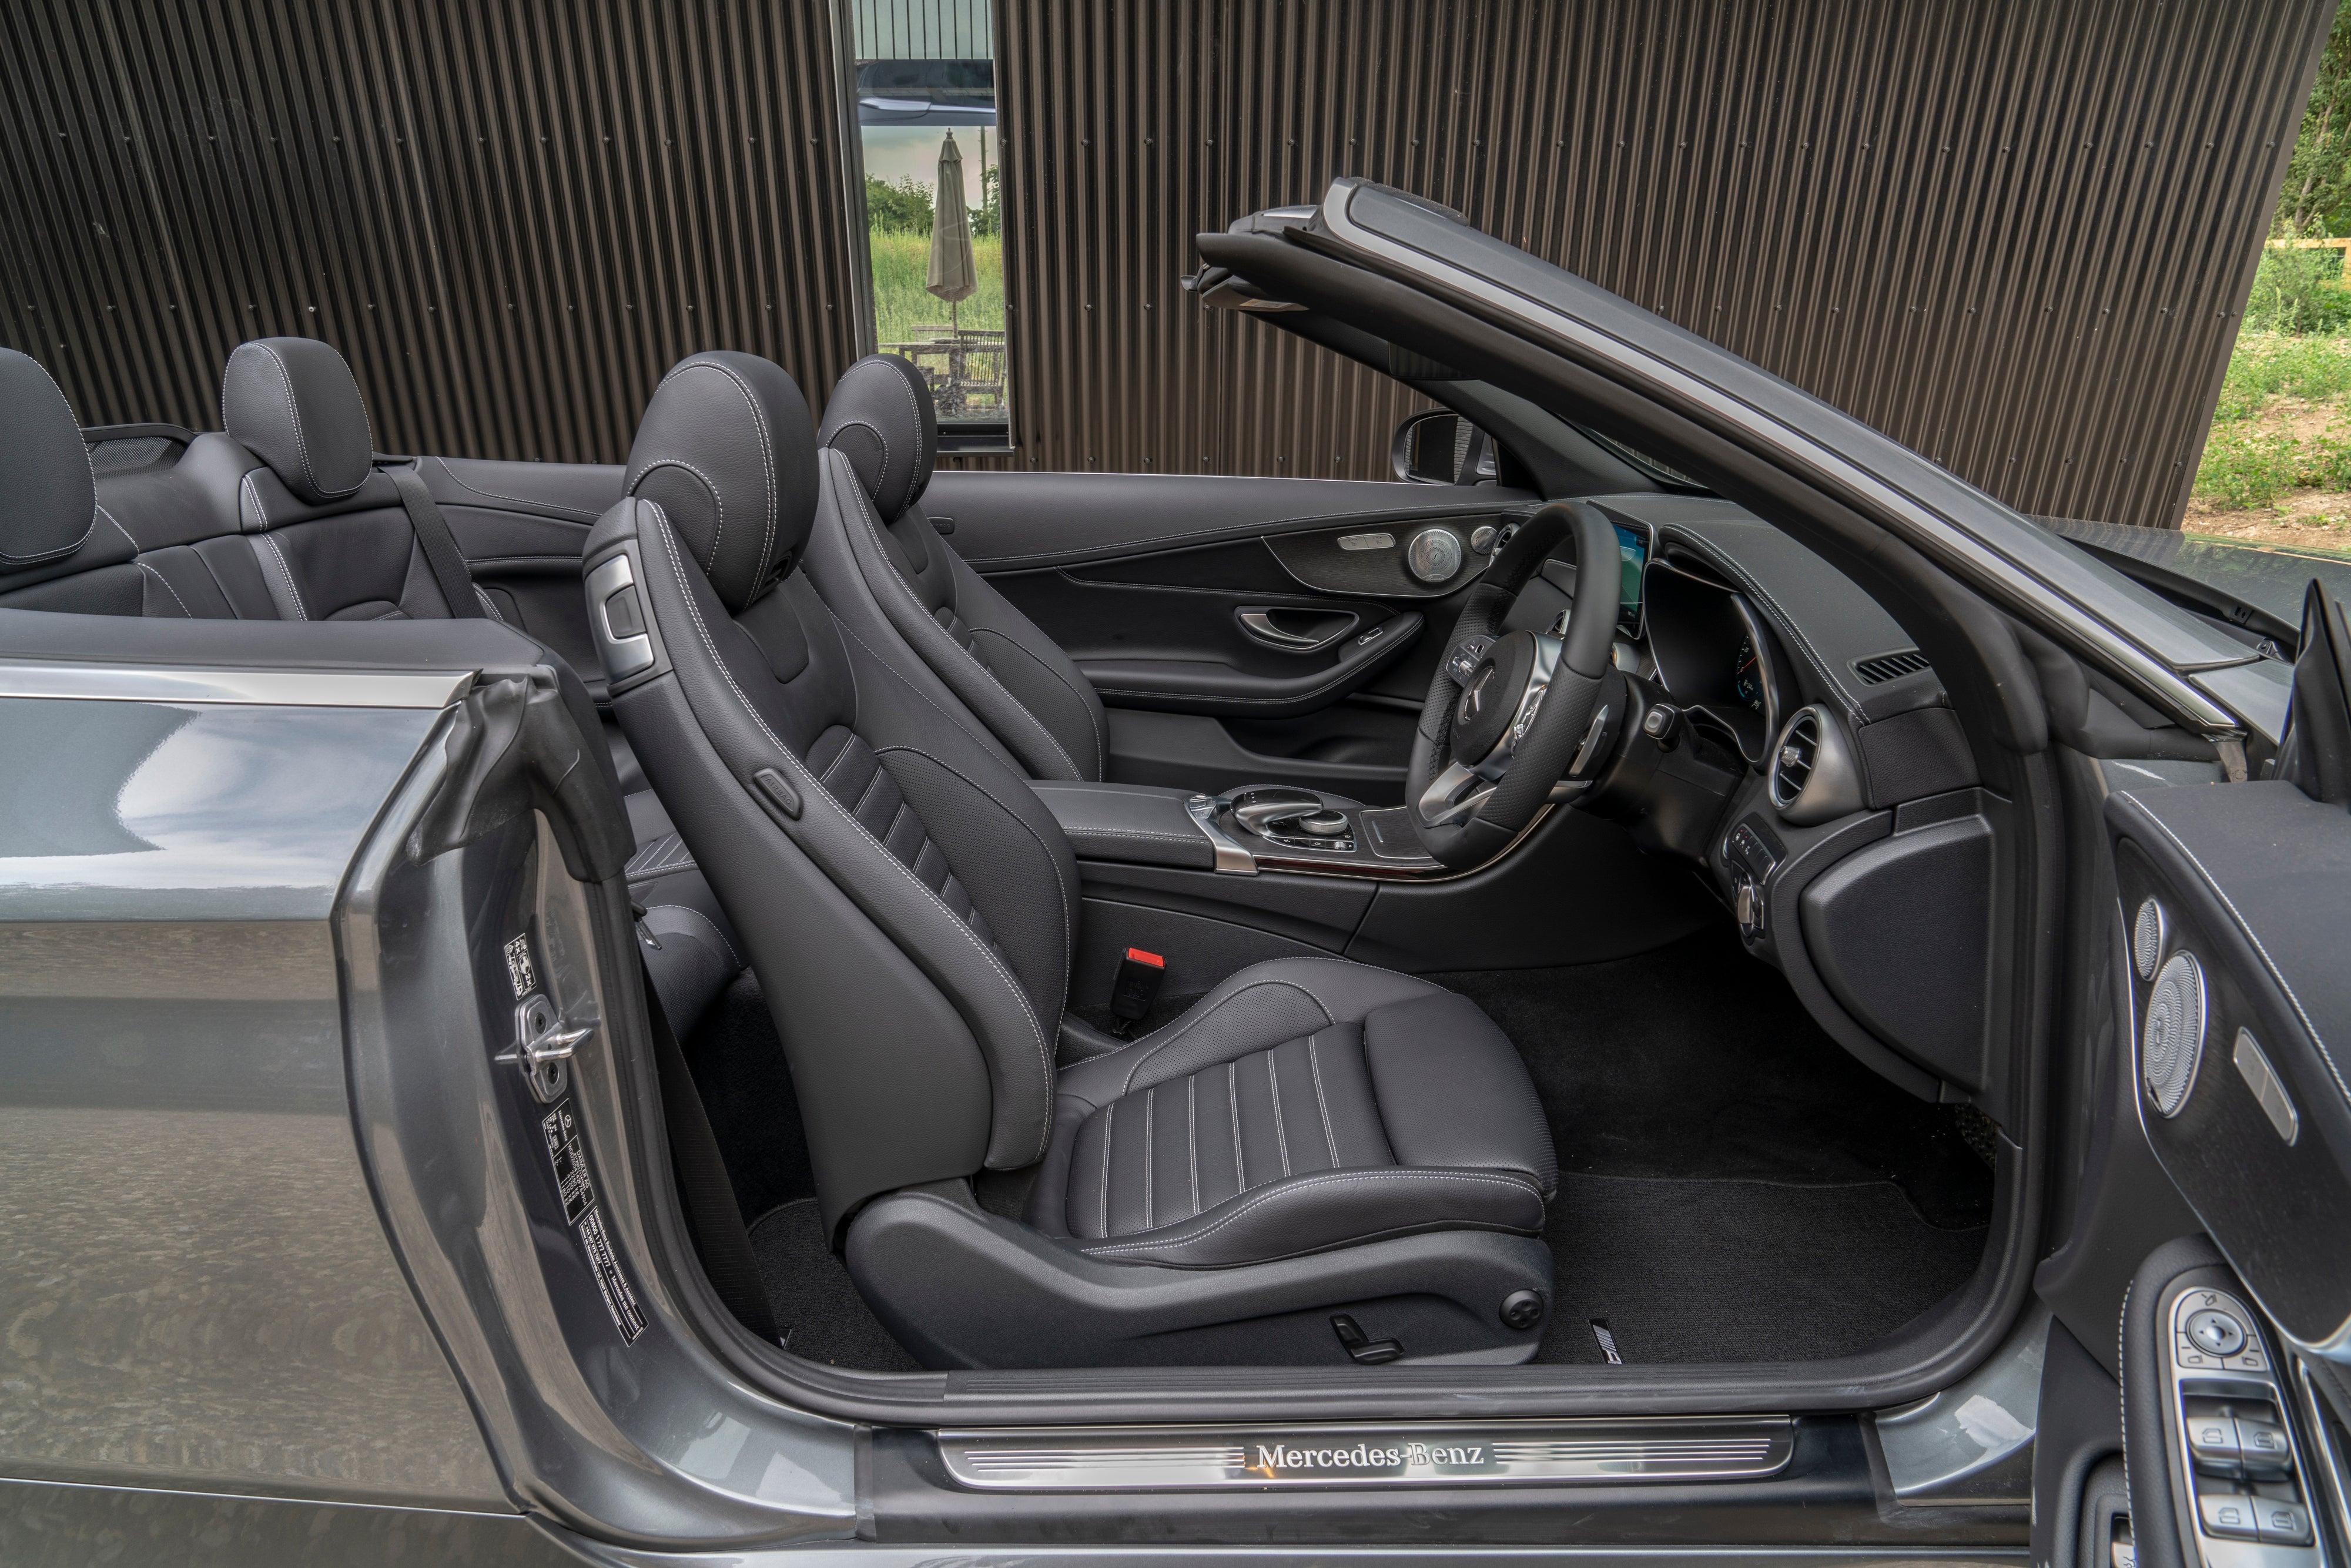 Mercedes C-Class Cabriolet side interior